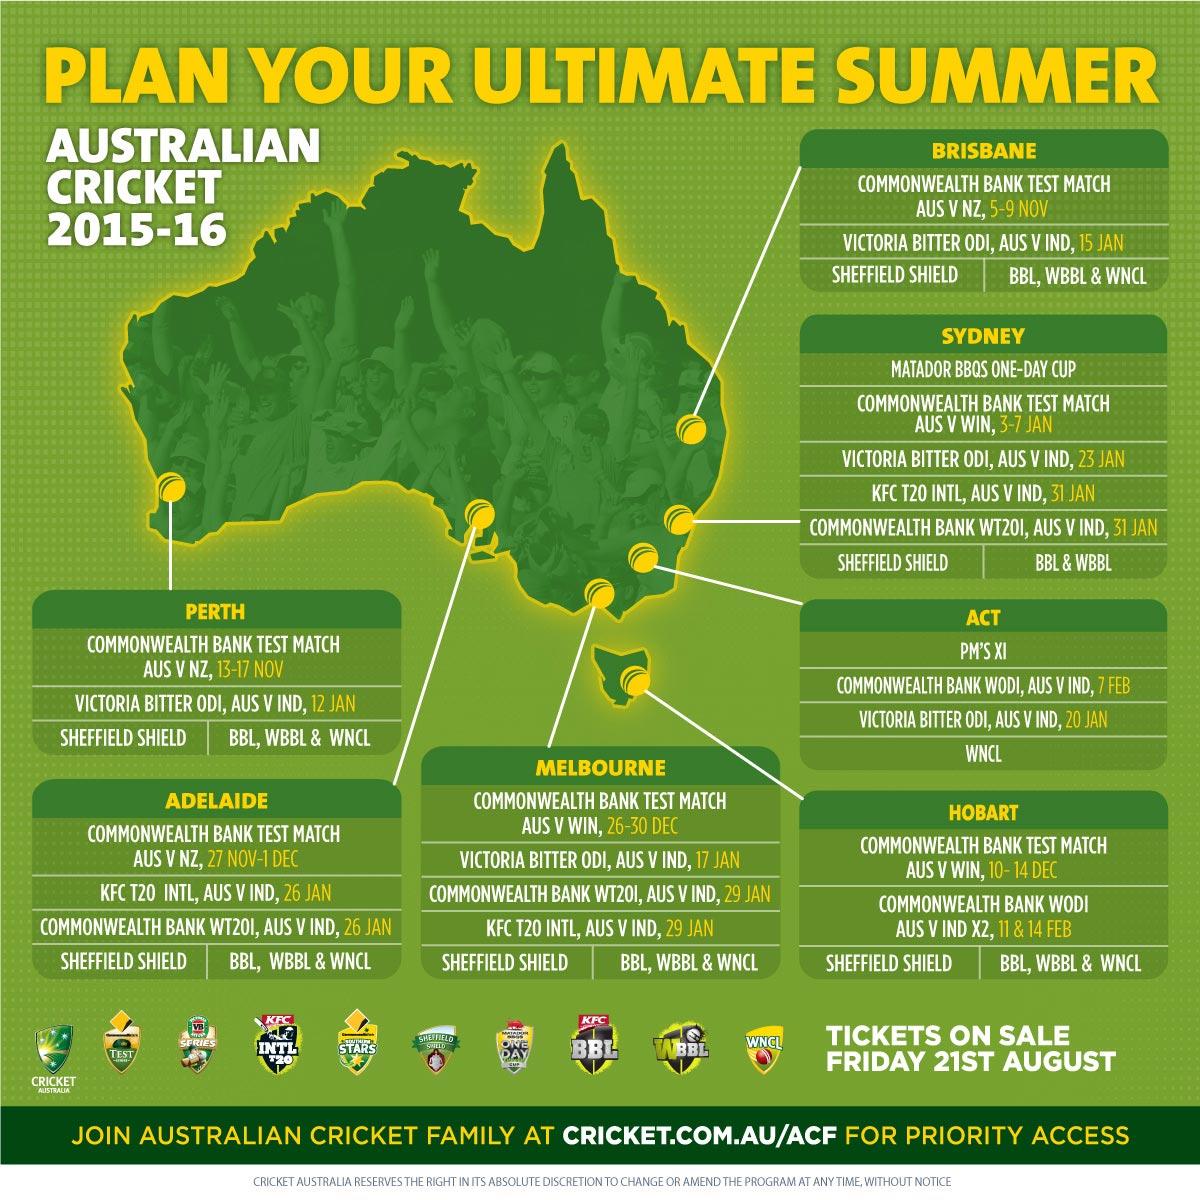 Southern Stars Summer Schedule Announced Cricket Com Au